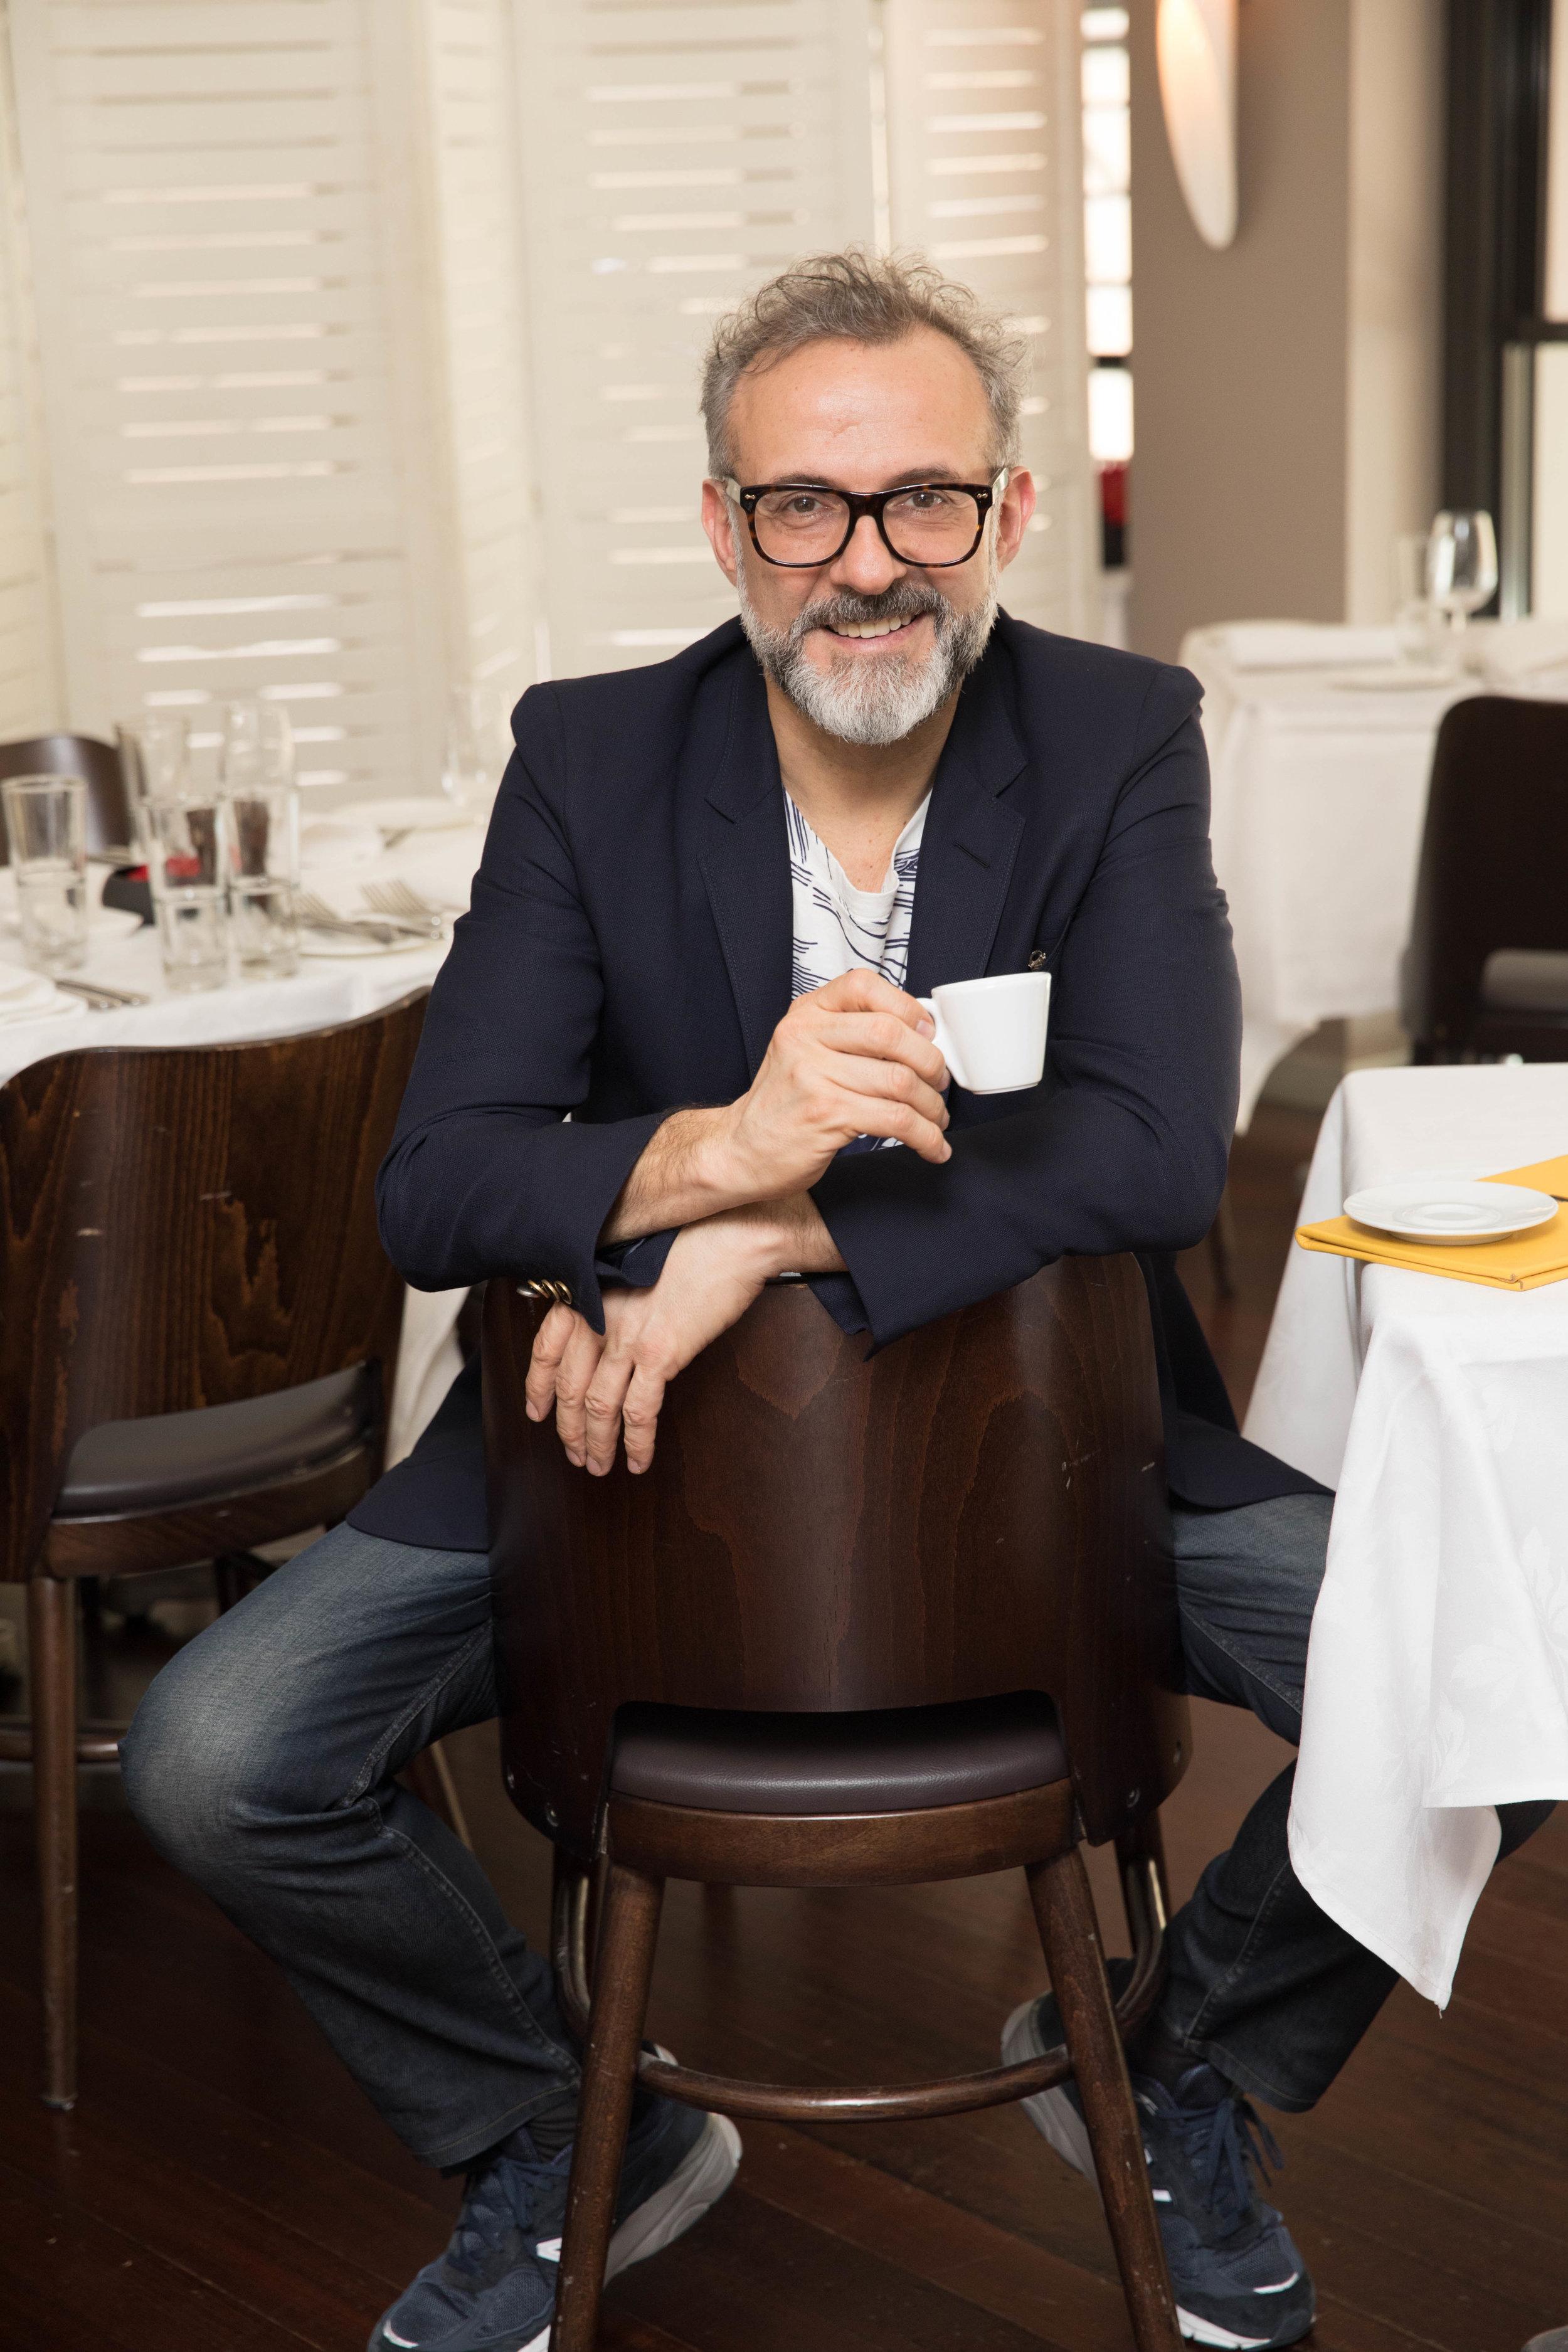 lavazza-massimo-bottura-worlds-50-best-restaurants-awards-2017-4.jpg